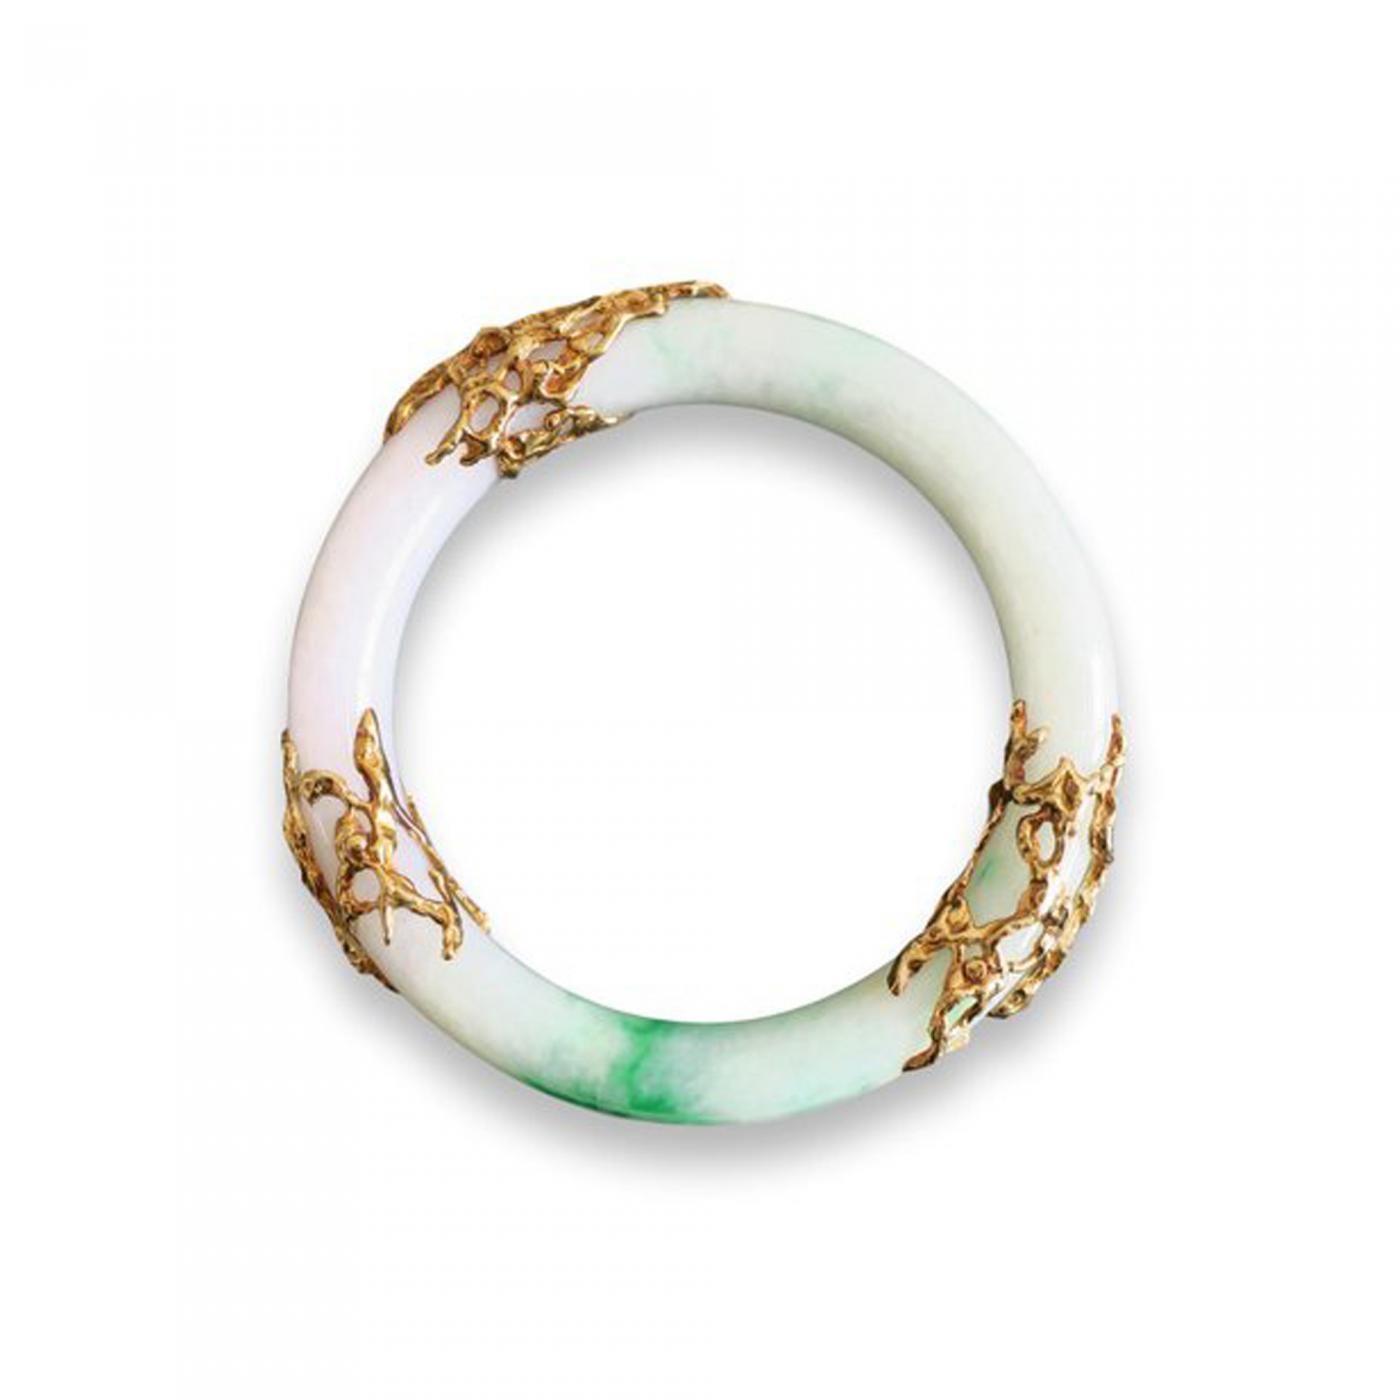 94c7acf69 Arthur King - Arthur King Jade and Gold Bangle Bracelet